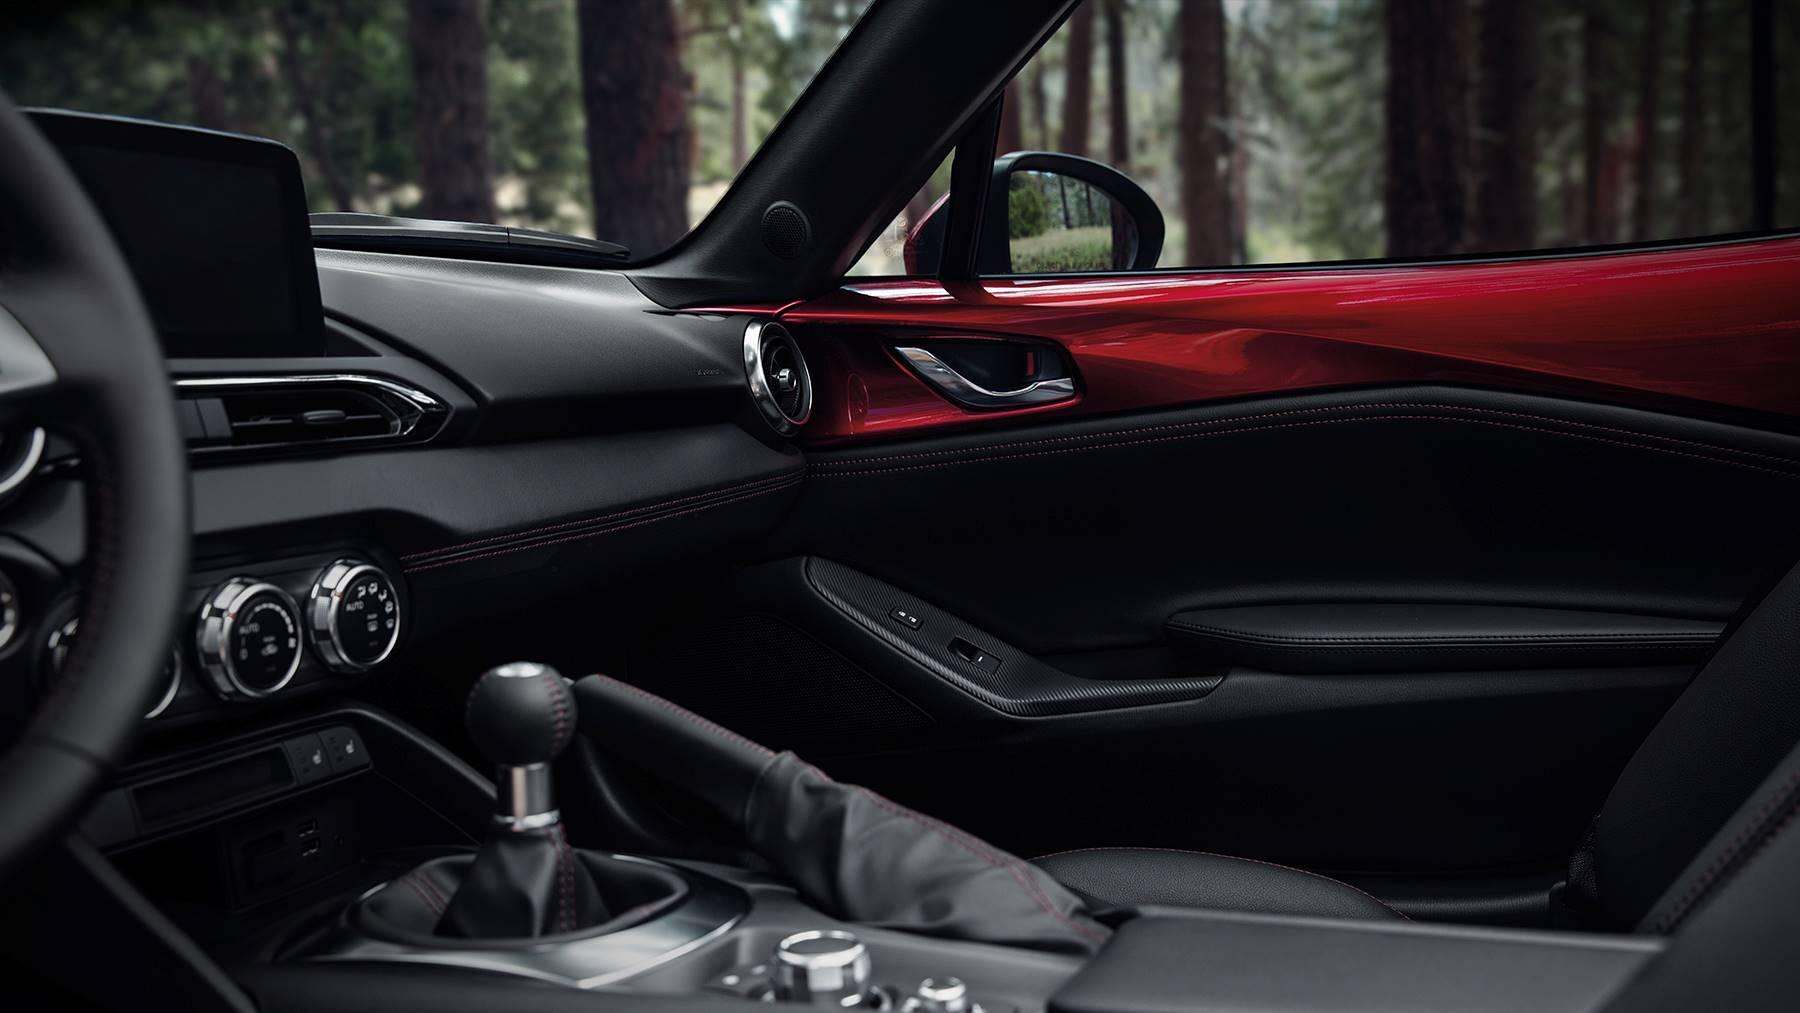 2019 Mazda Mx 5 Miata Interiorjpg